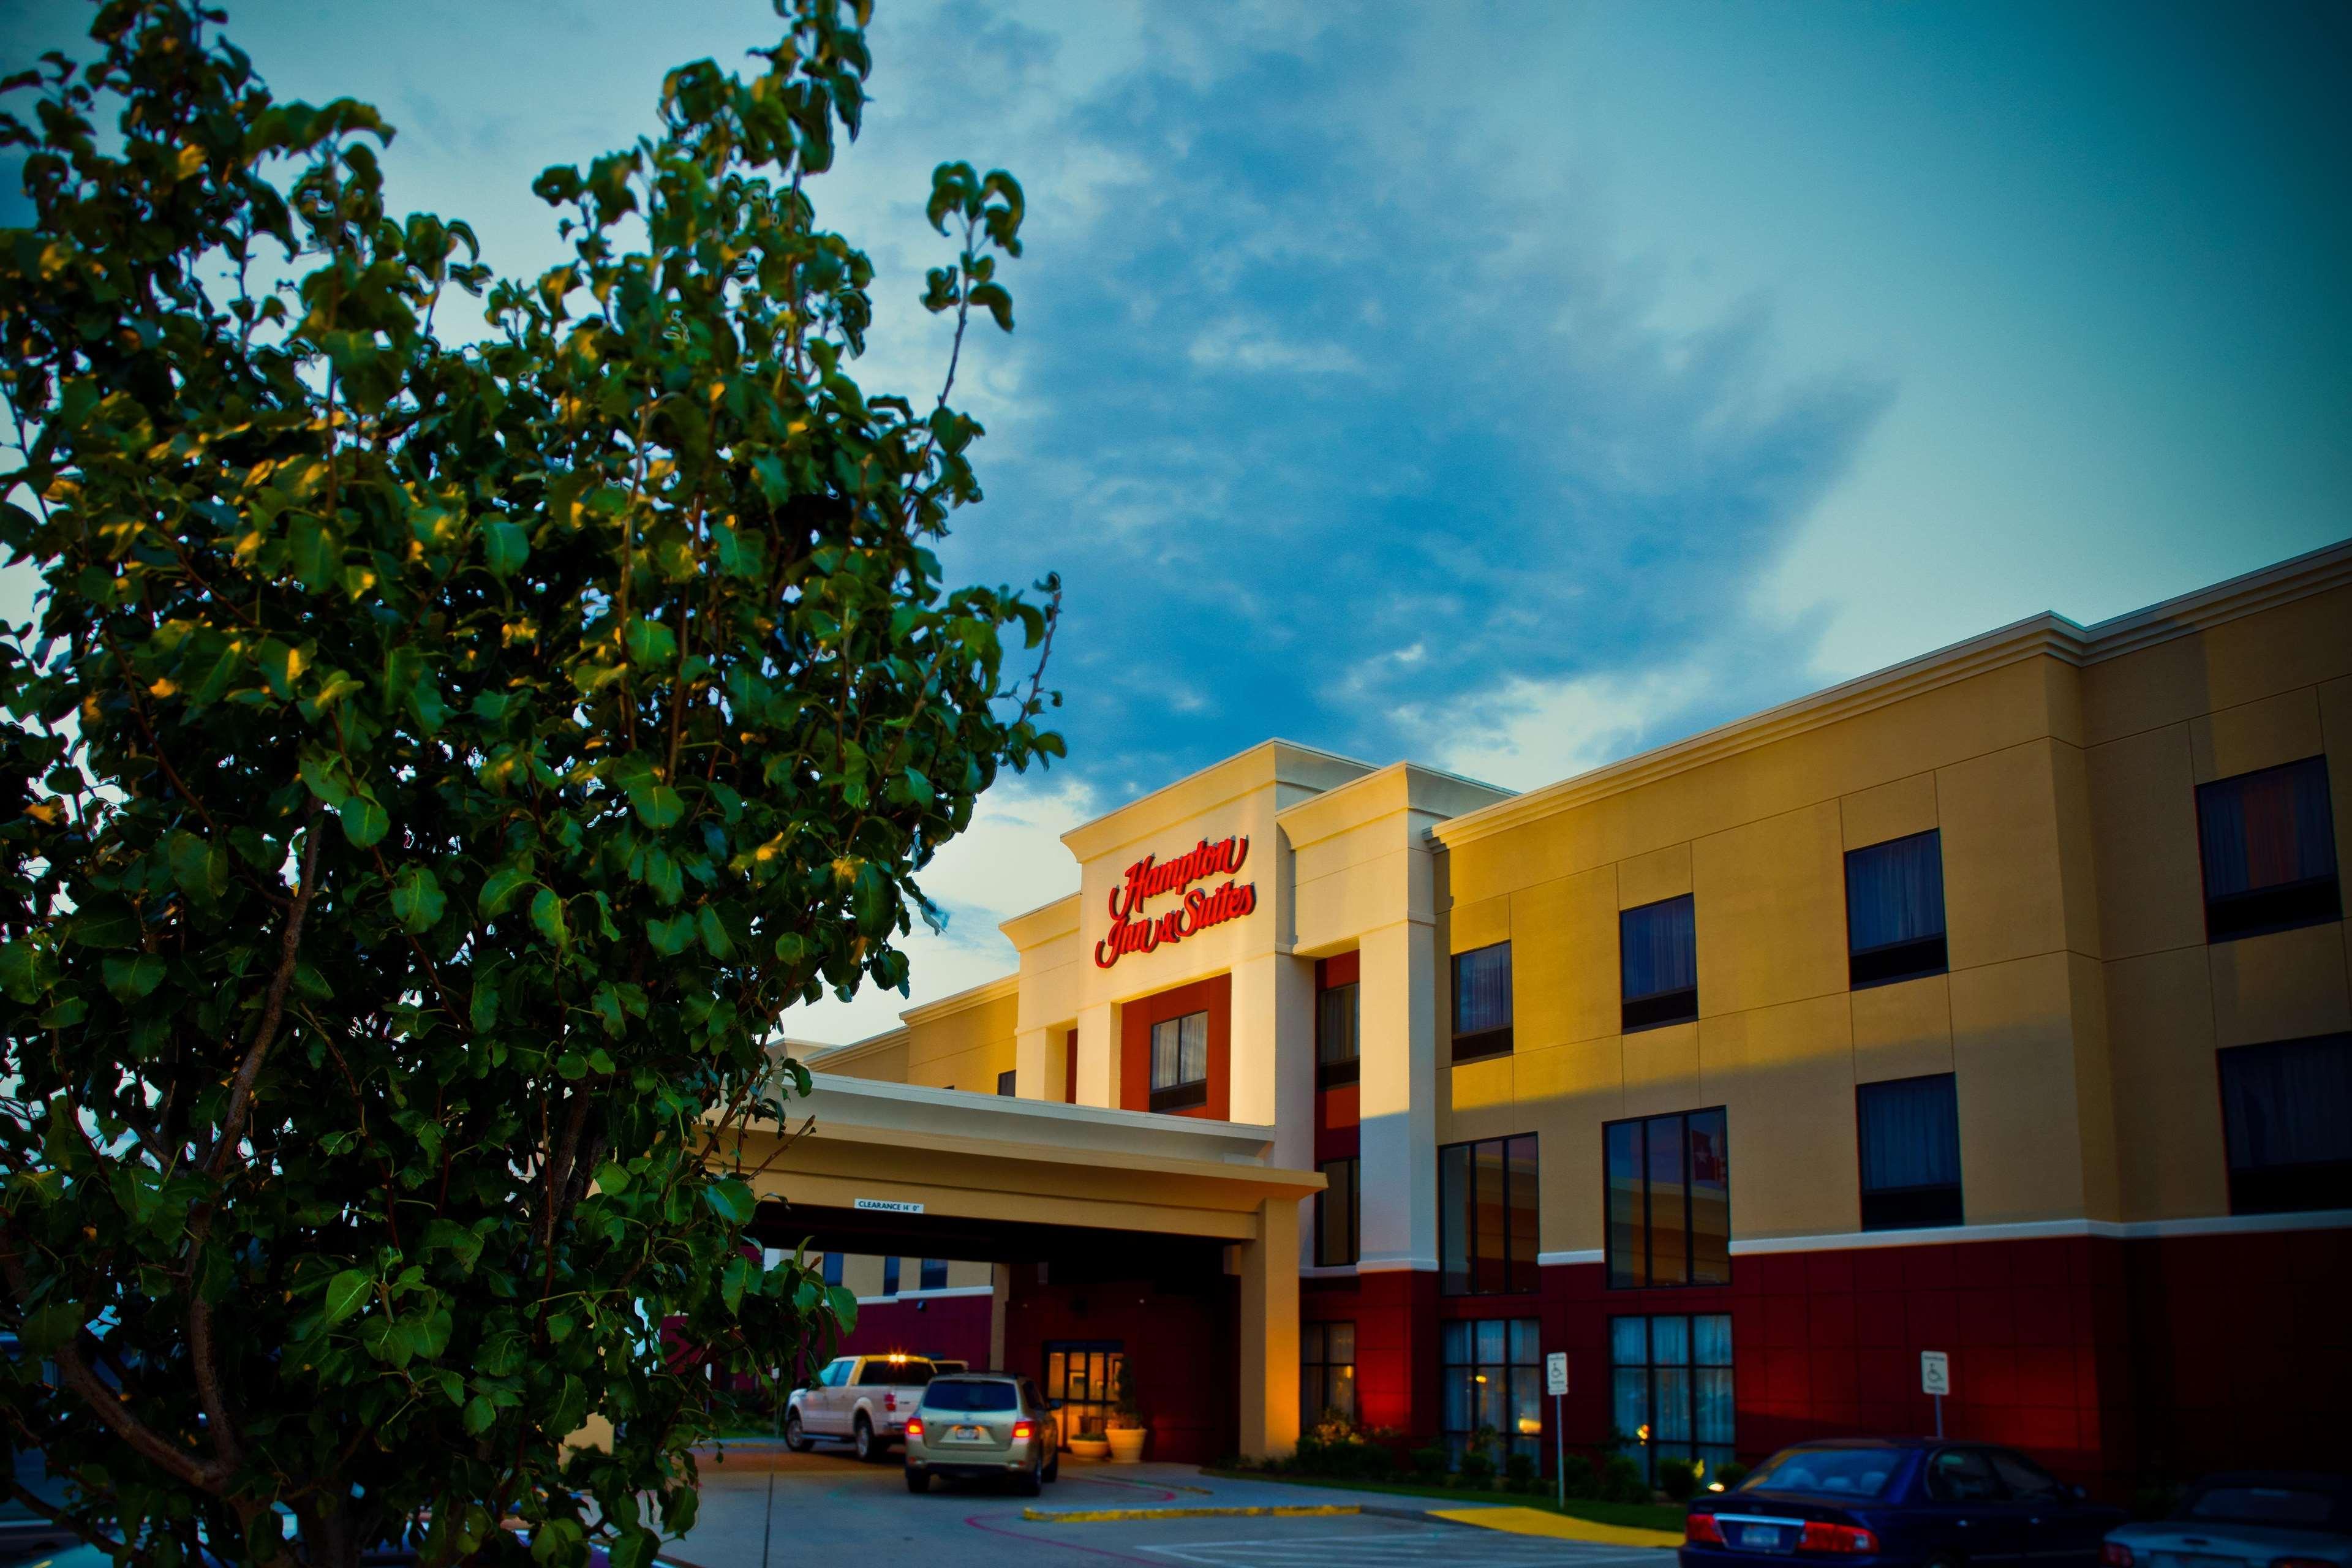 Hampton Inn & Suites Childress image 1